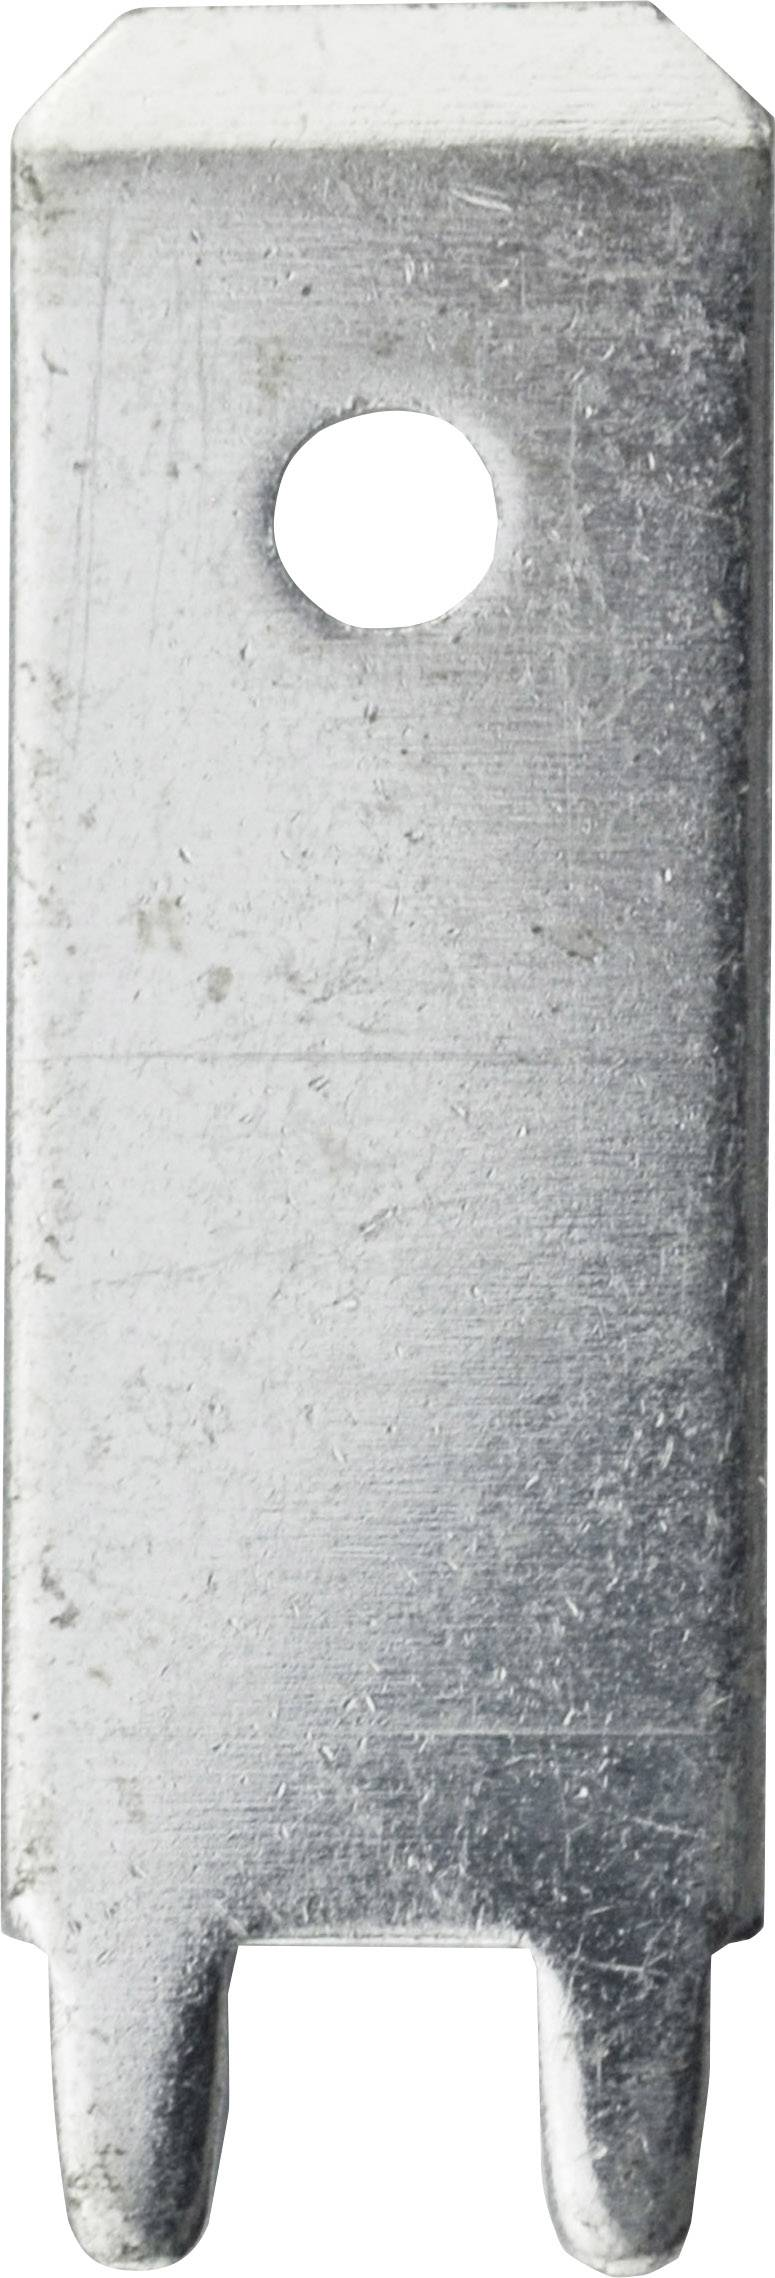 Faston zástrčka Vogt Verbindungstechnik 3866m.68 6.3 mm x 180 °, bez izolace, kov, 100 ks